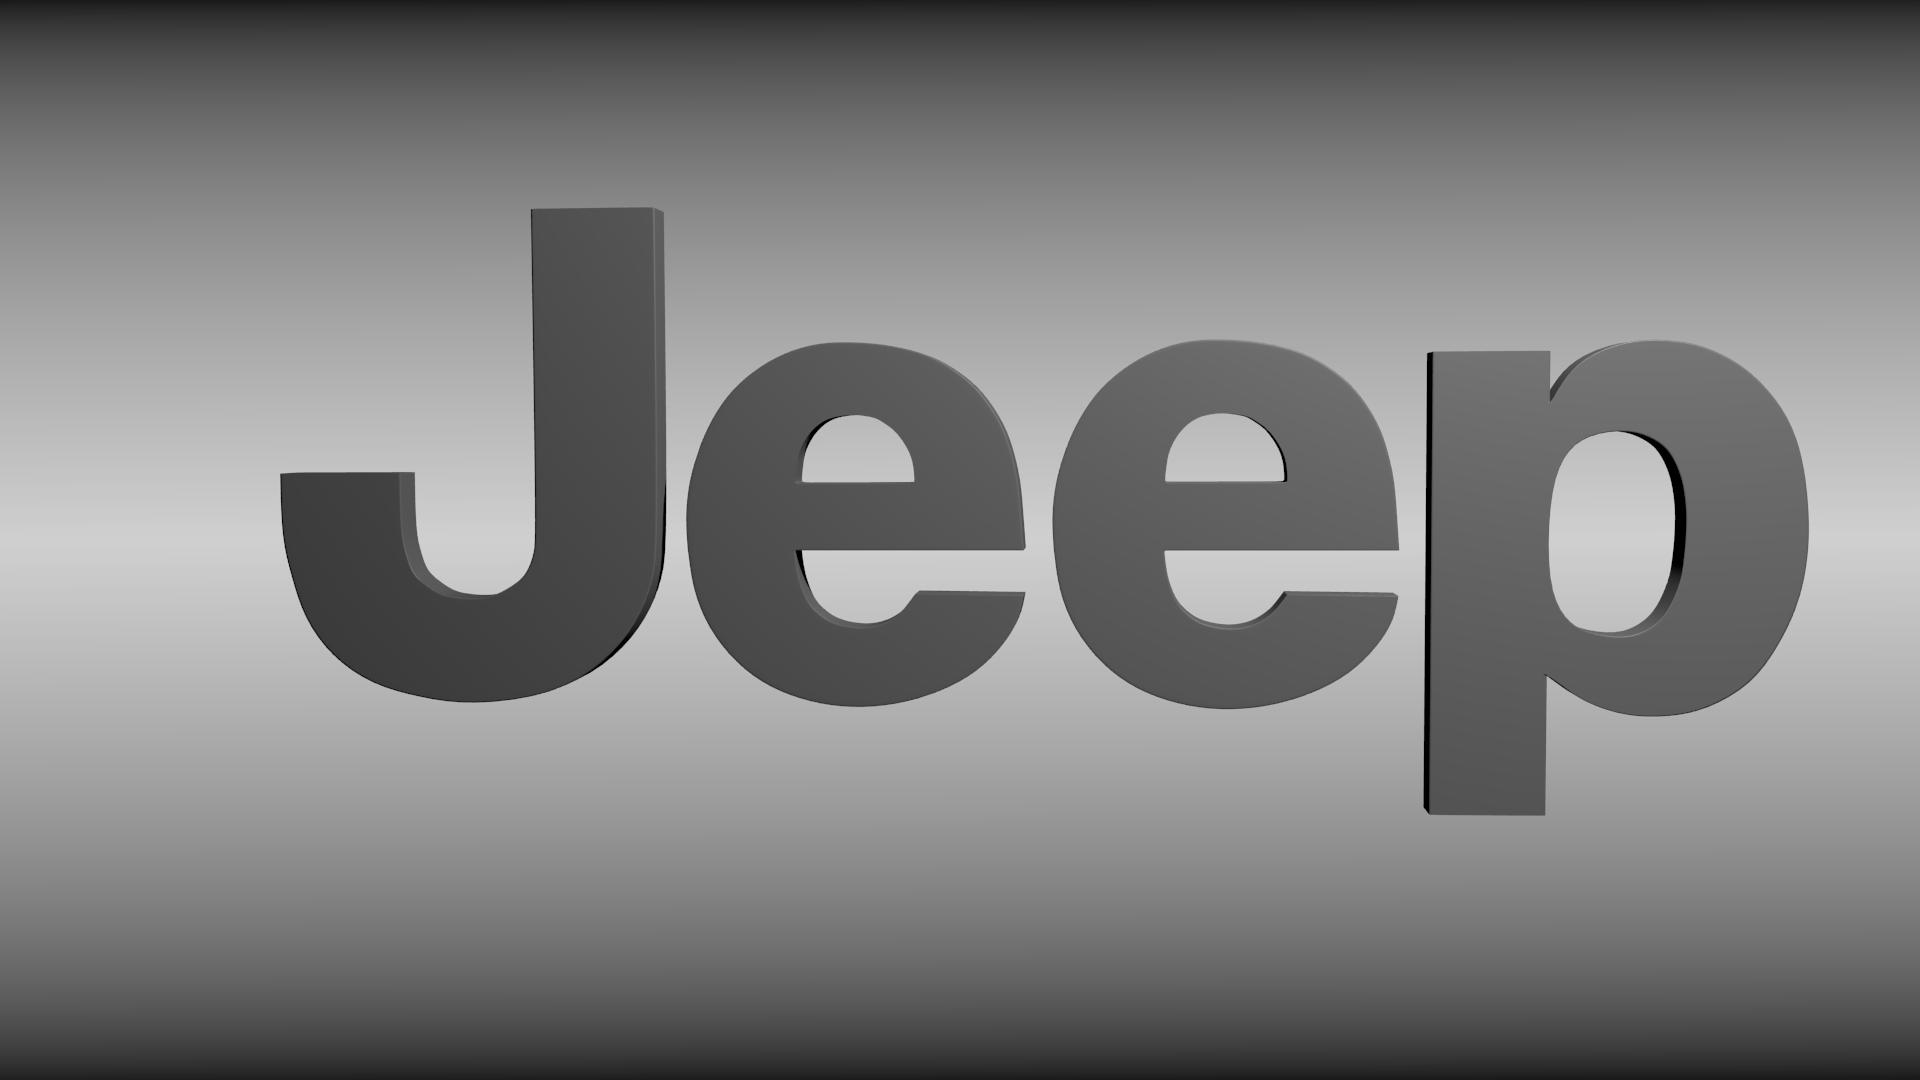 jeep logo 3d model obj blend cgtradercom